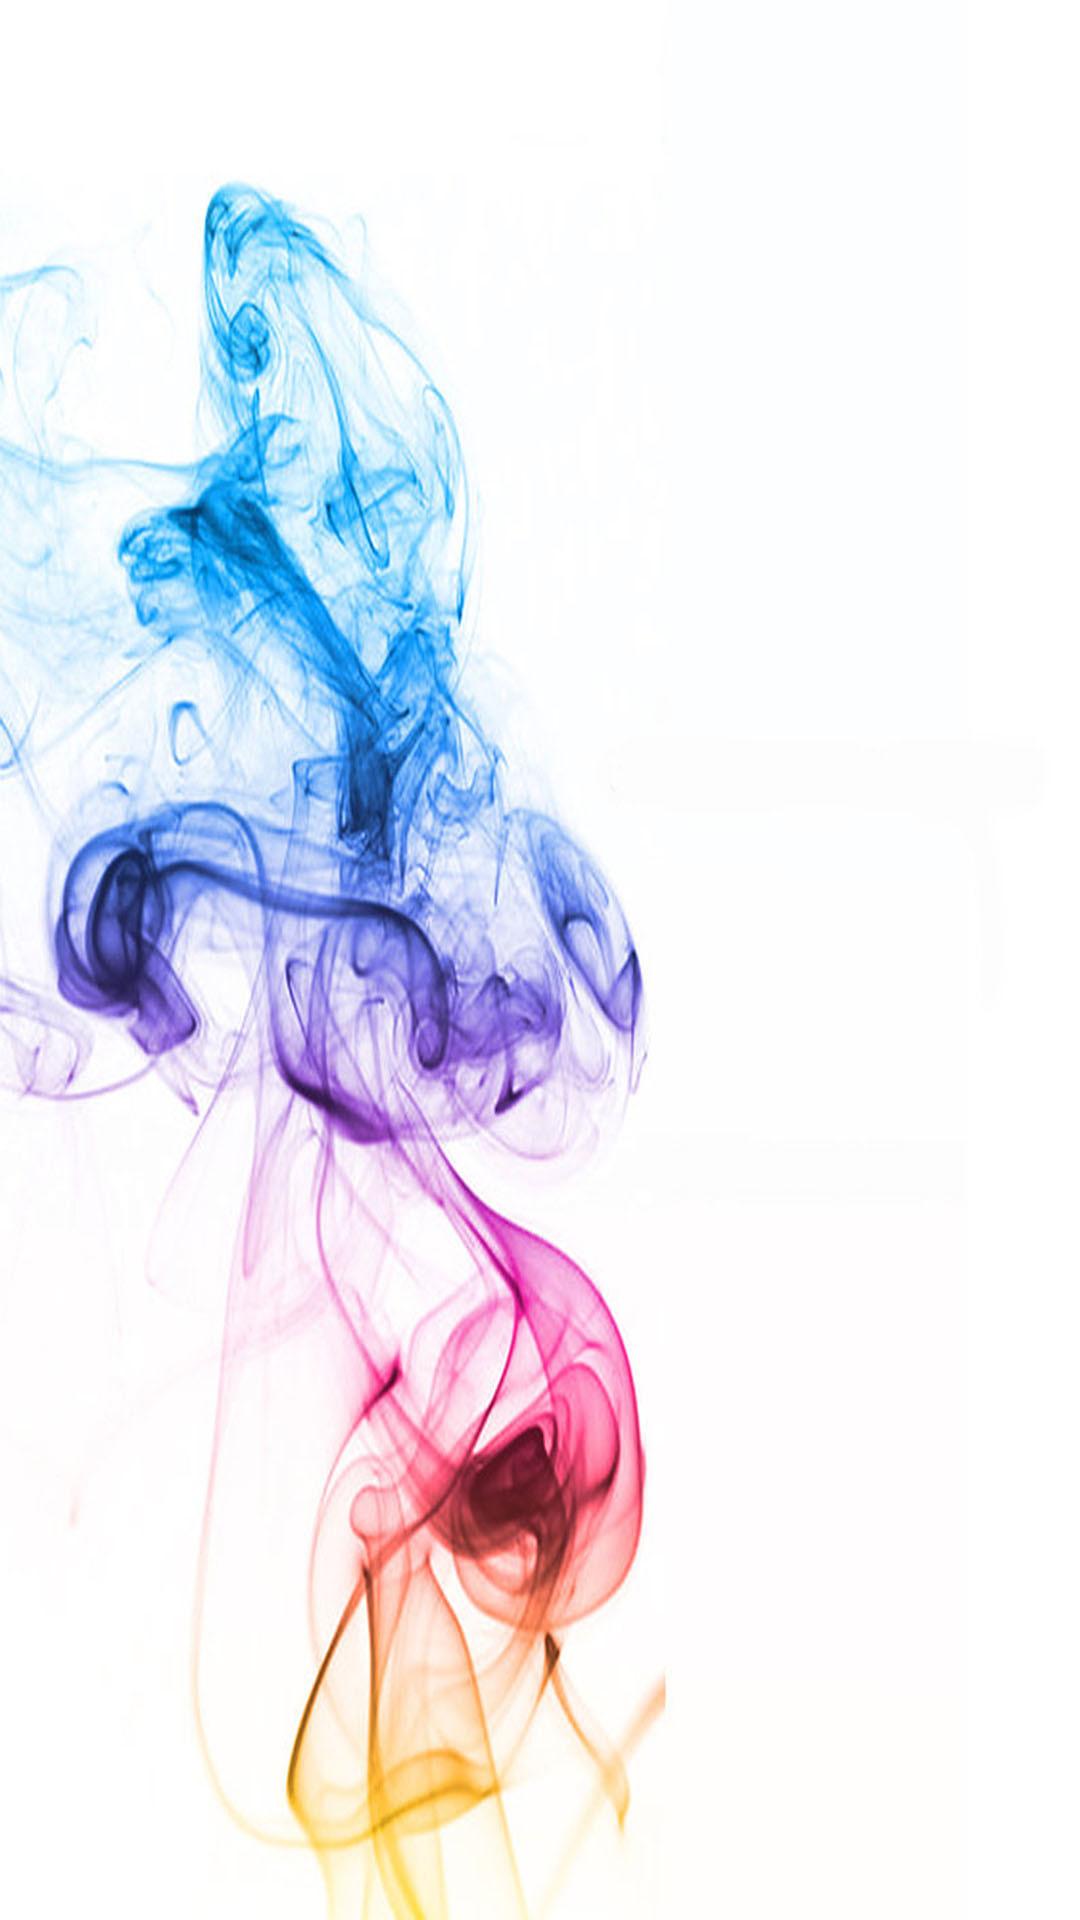 Distorted Color Smoke Wallpaper